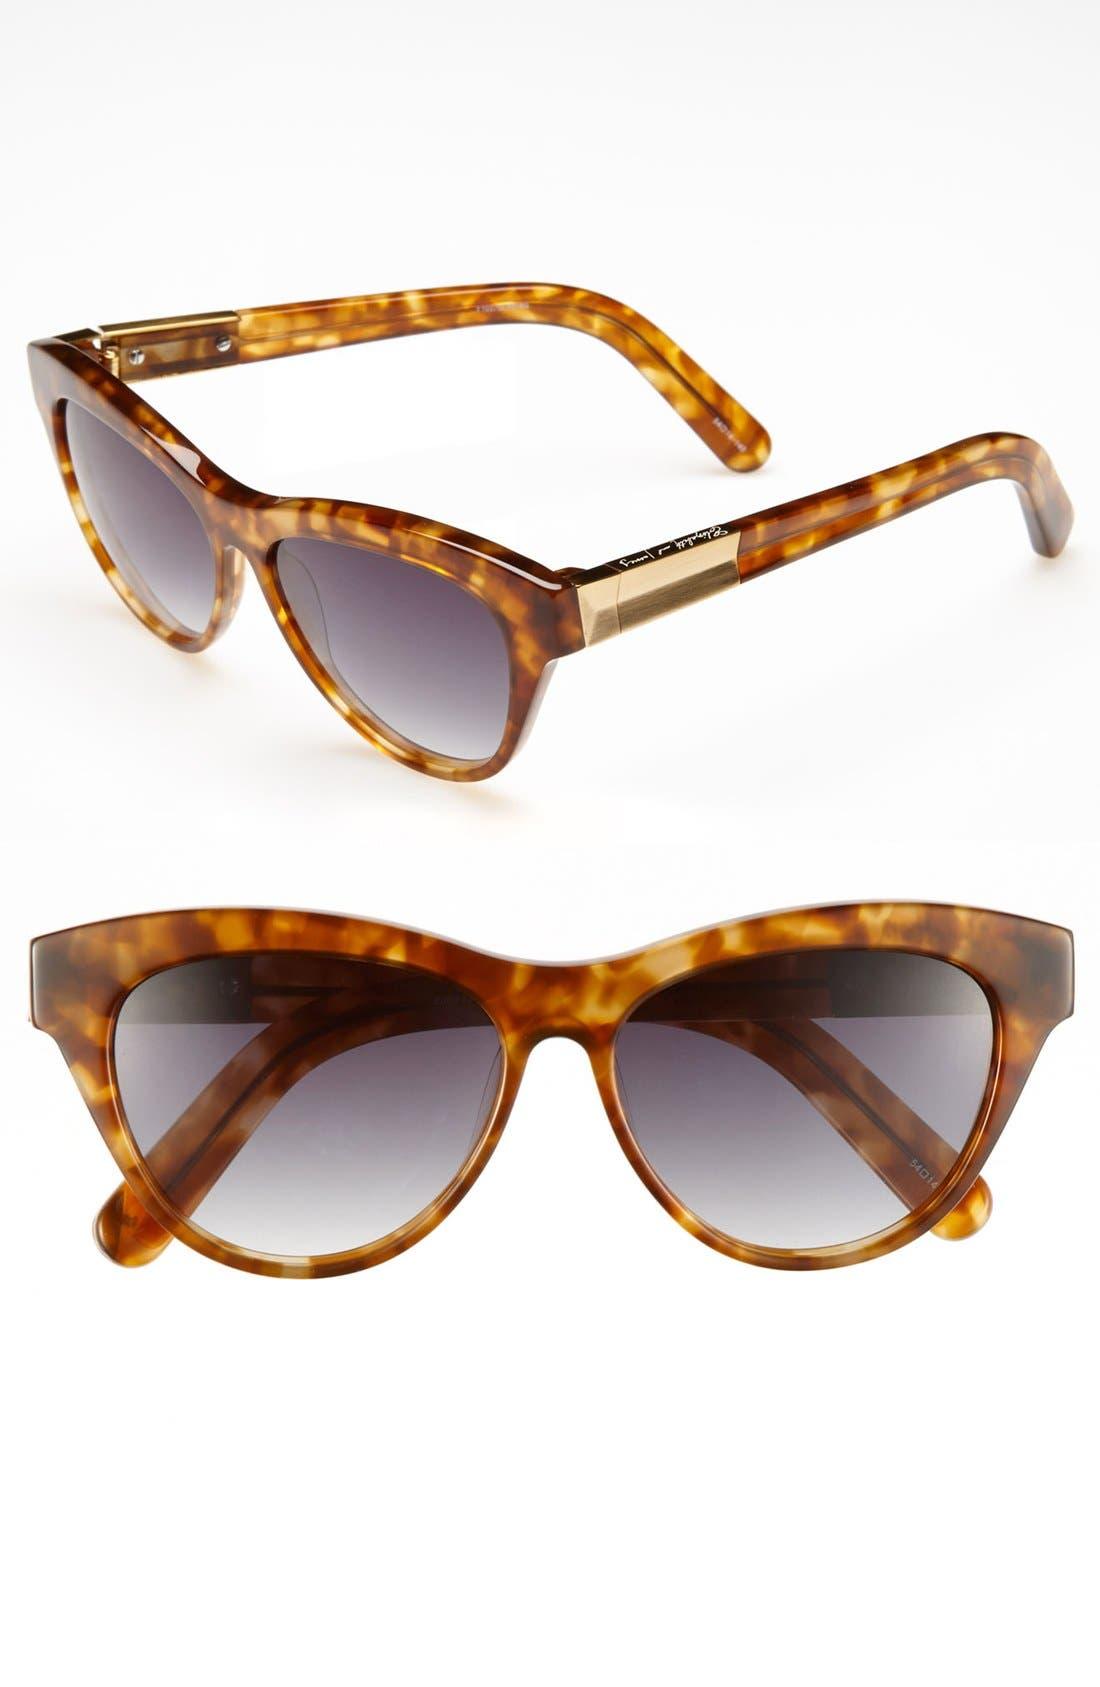 Main Image - Elizabeth and James 54mm Retro Sunglasses